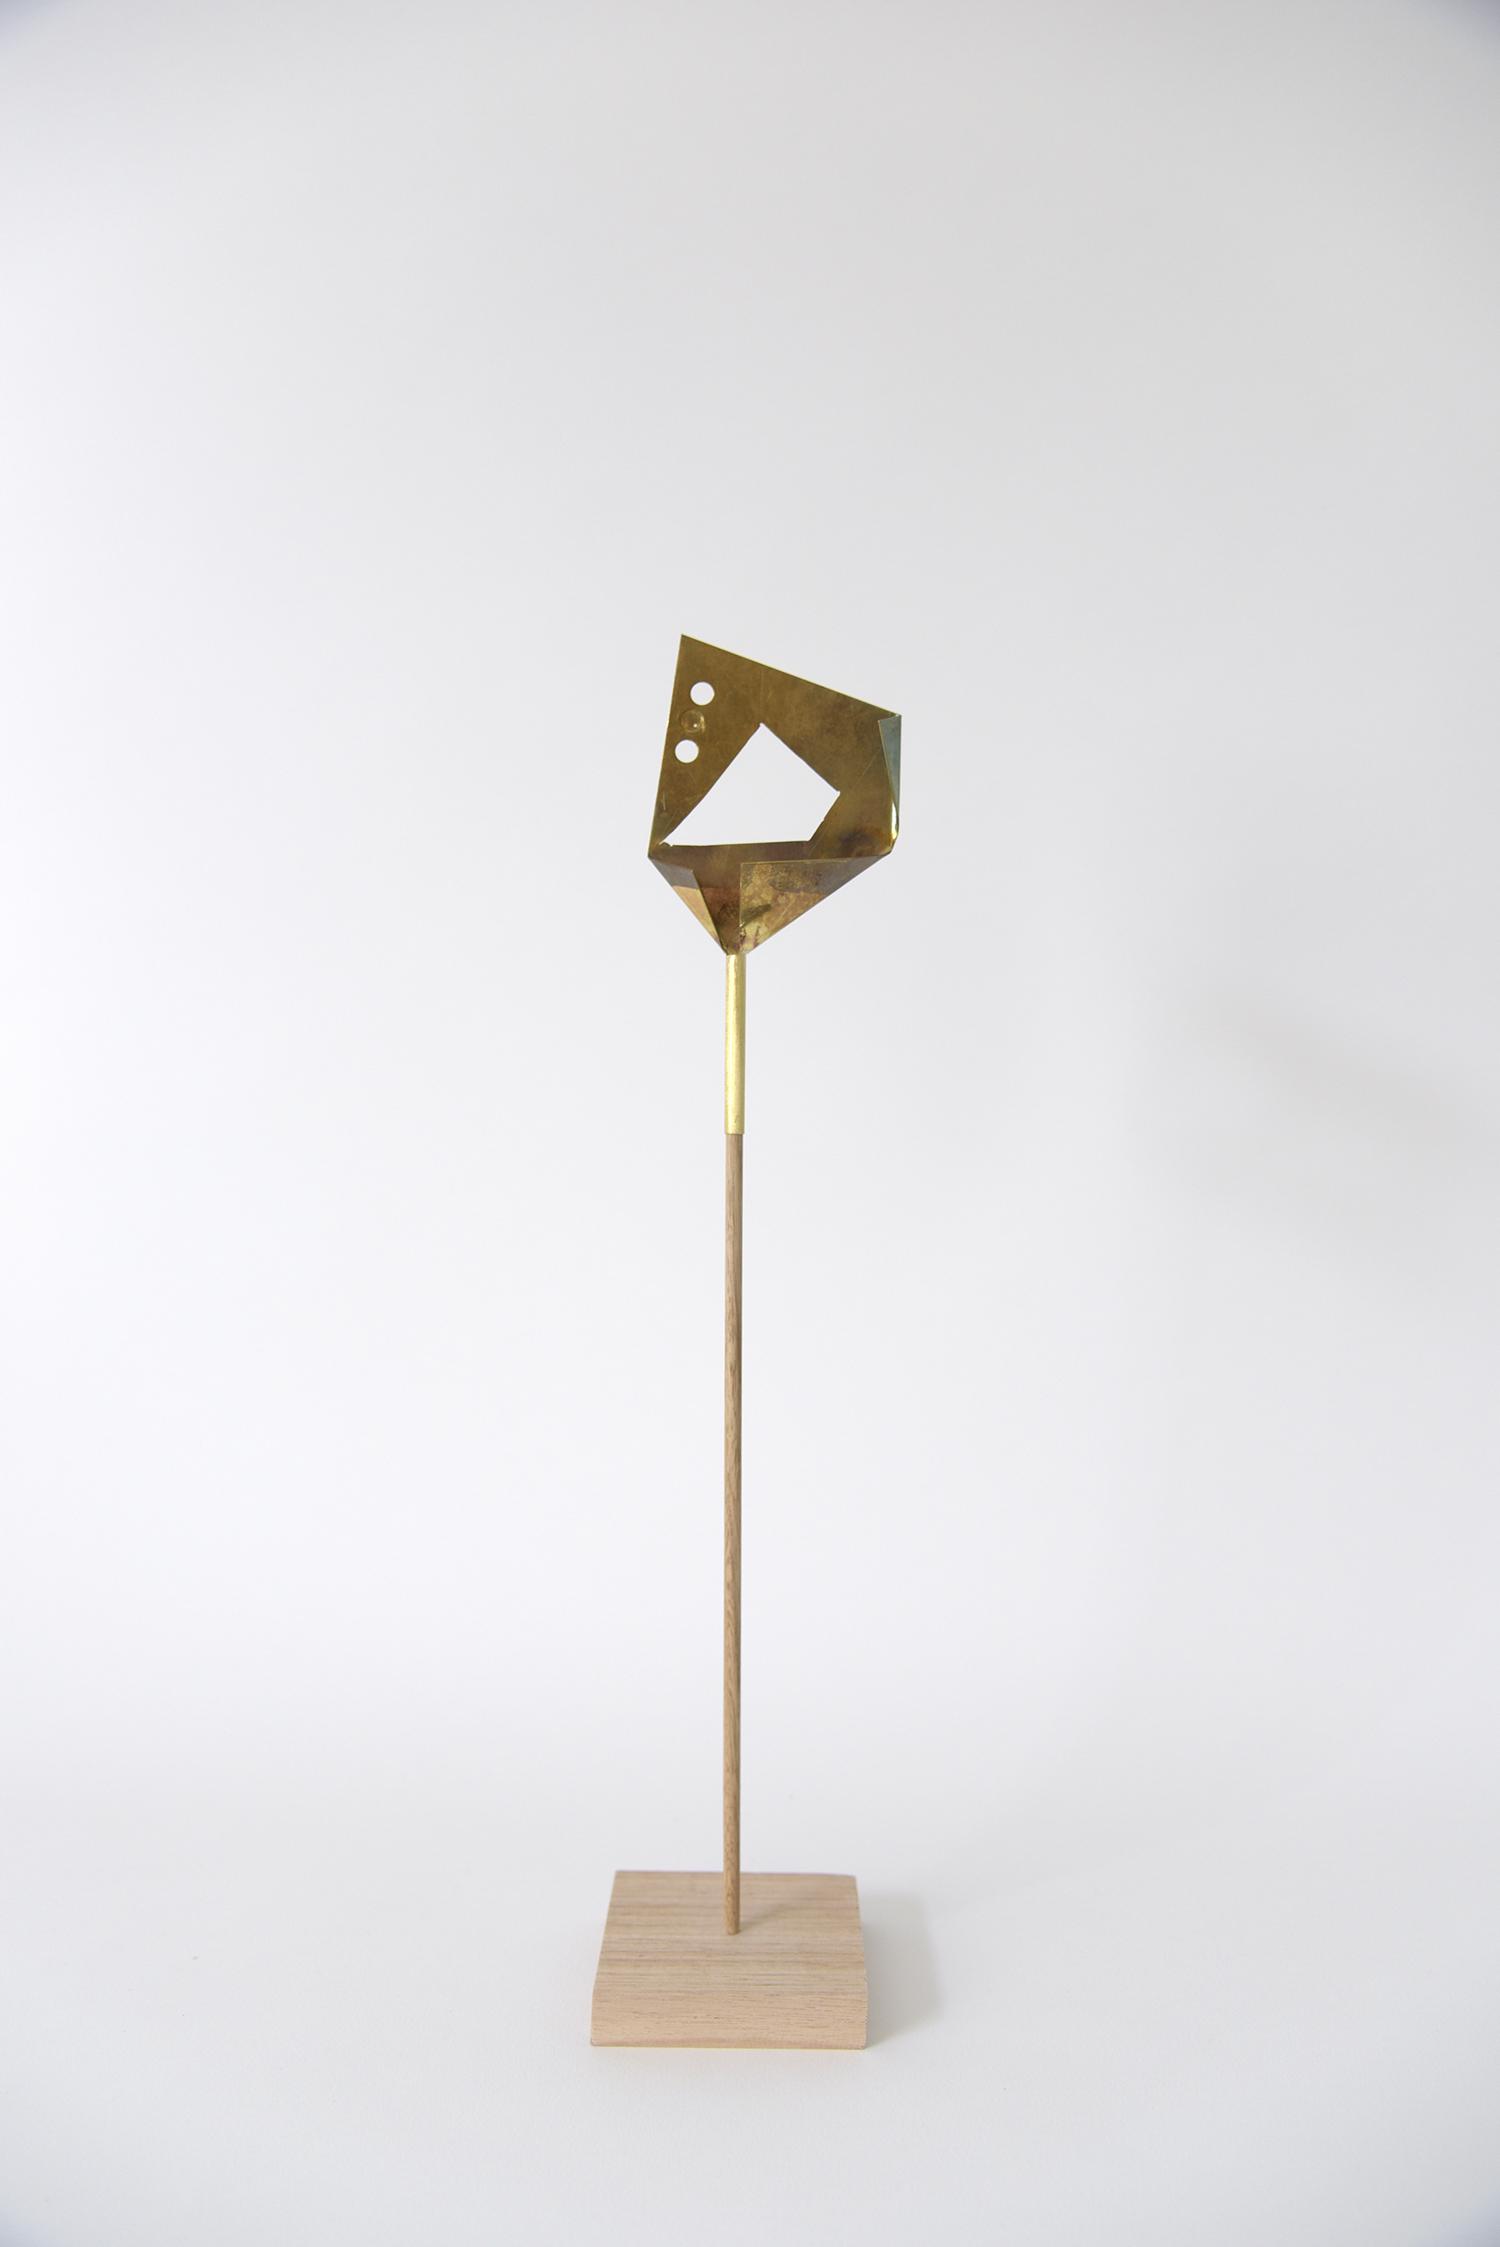 Hardbody Sculpture (Object) XVI